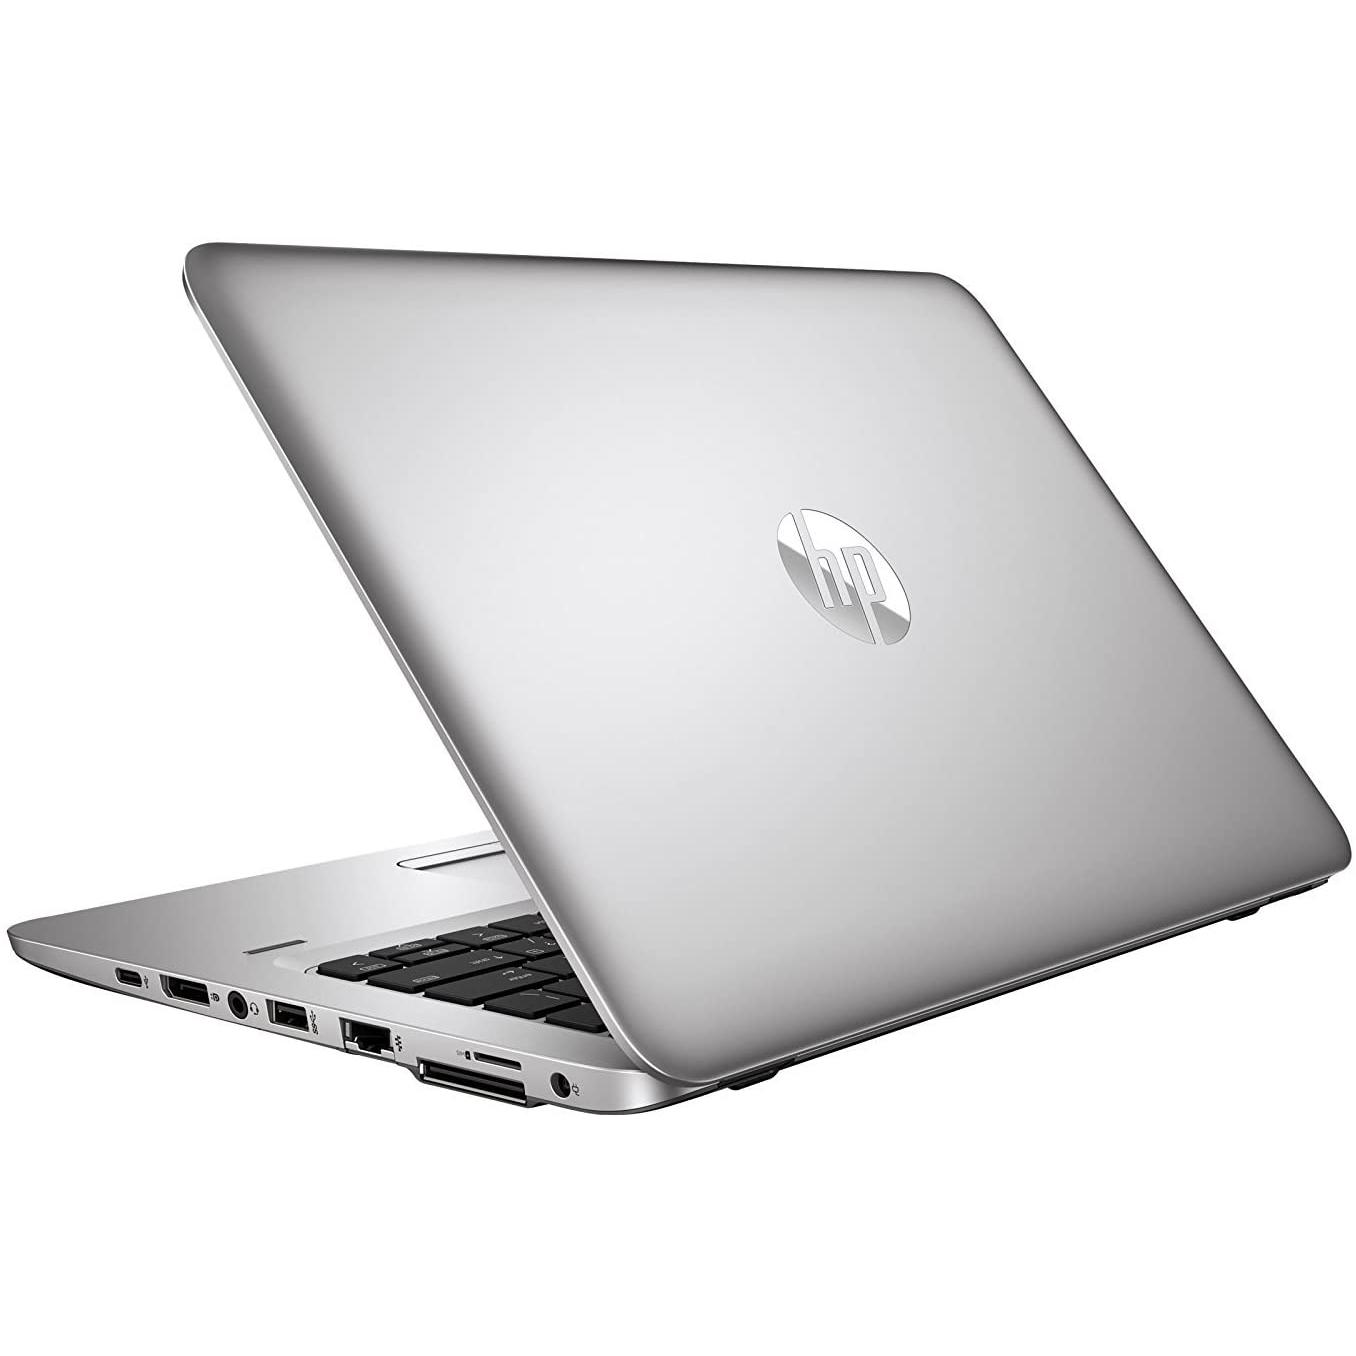 "Hp EliteBook 820 G3 12"" Core i5 2,3 GHz - SSD 240 Go - 8 Go QWERTZ - Allemand"